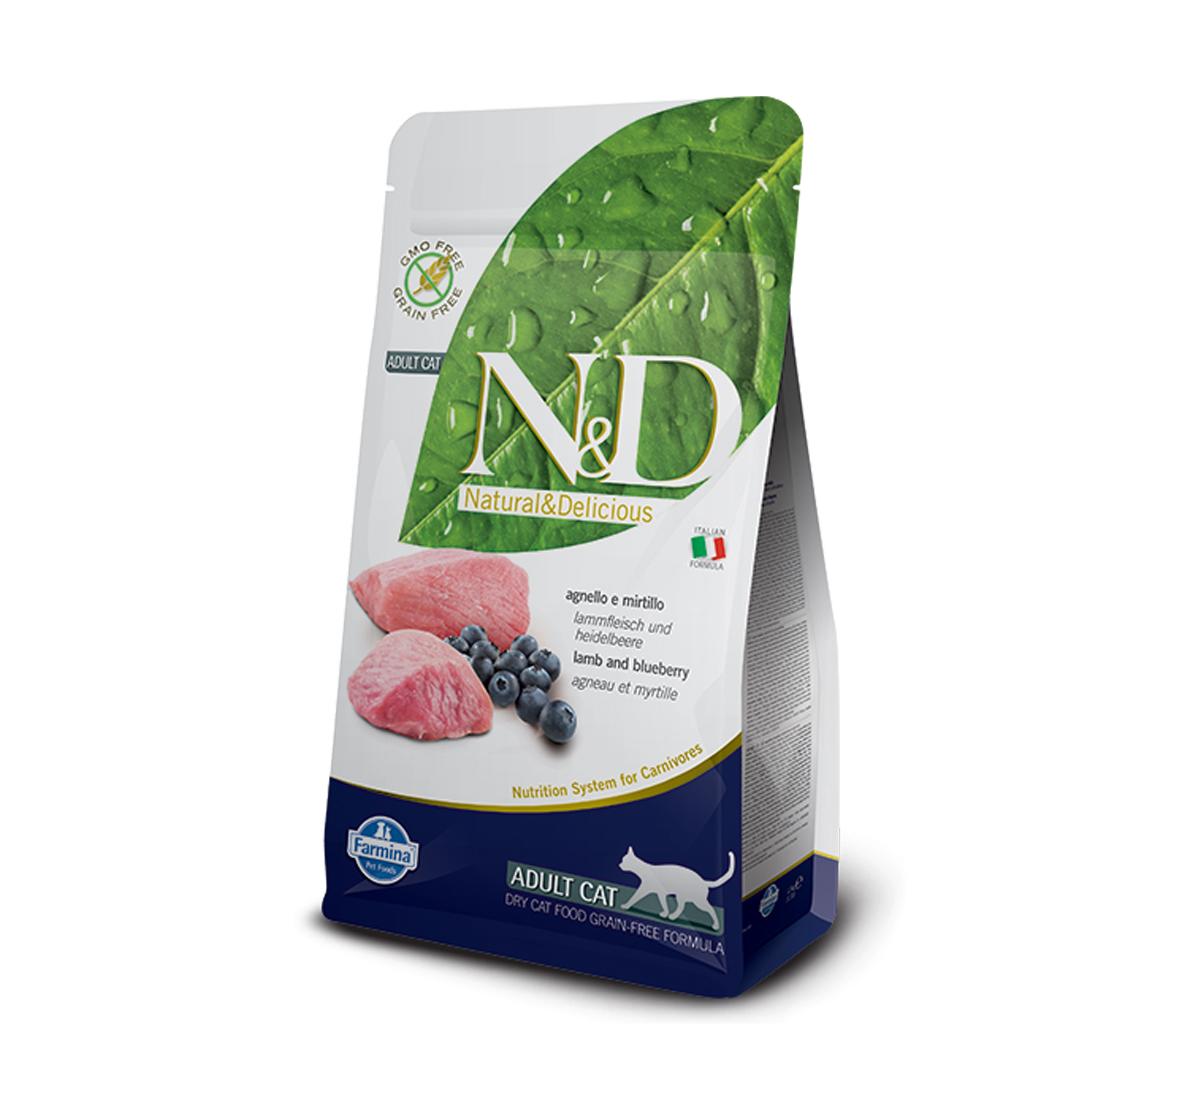 Farmina N&D Dry Cat Food Grain Free Lamb & Blueberry Adult Cat - 1.5 Kg (Pack Of 8)